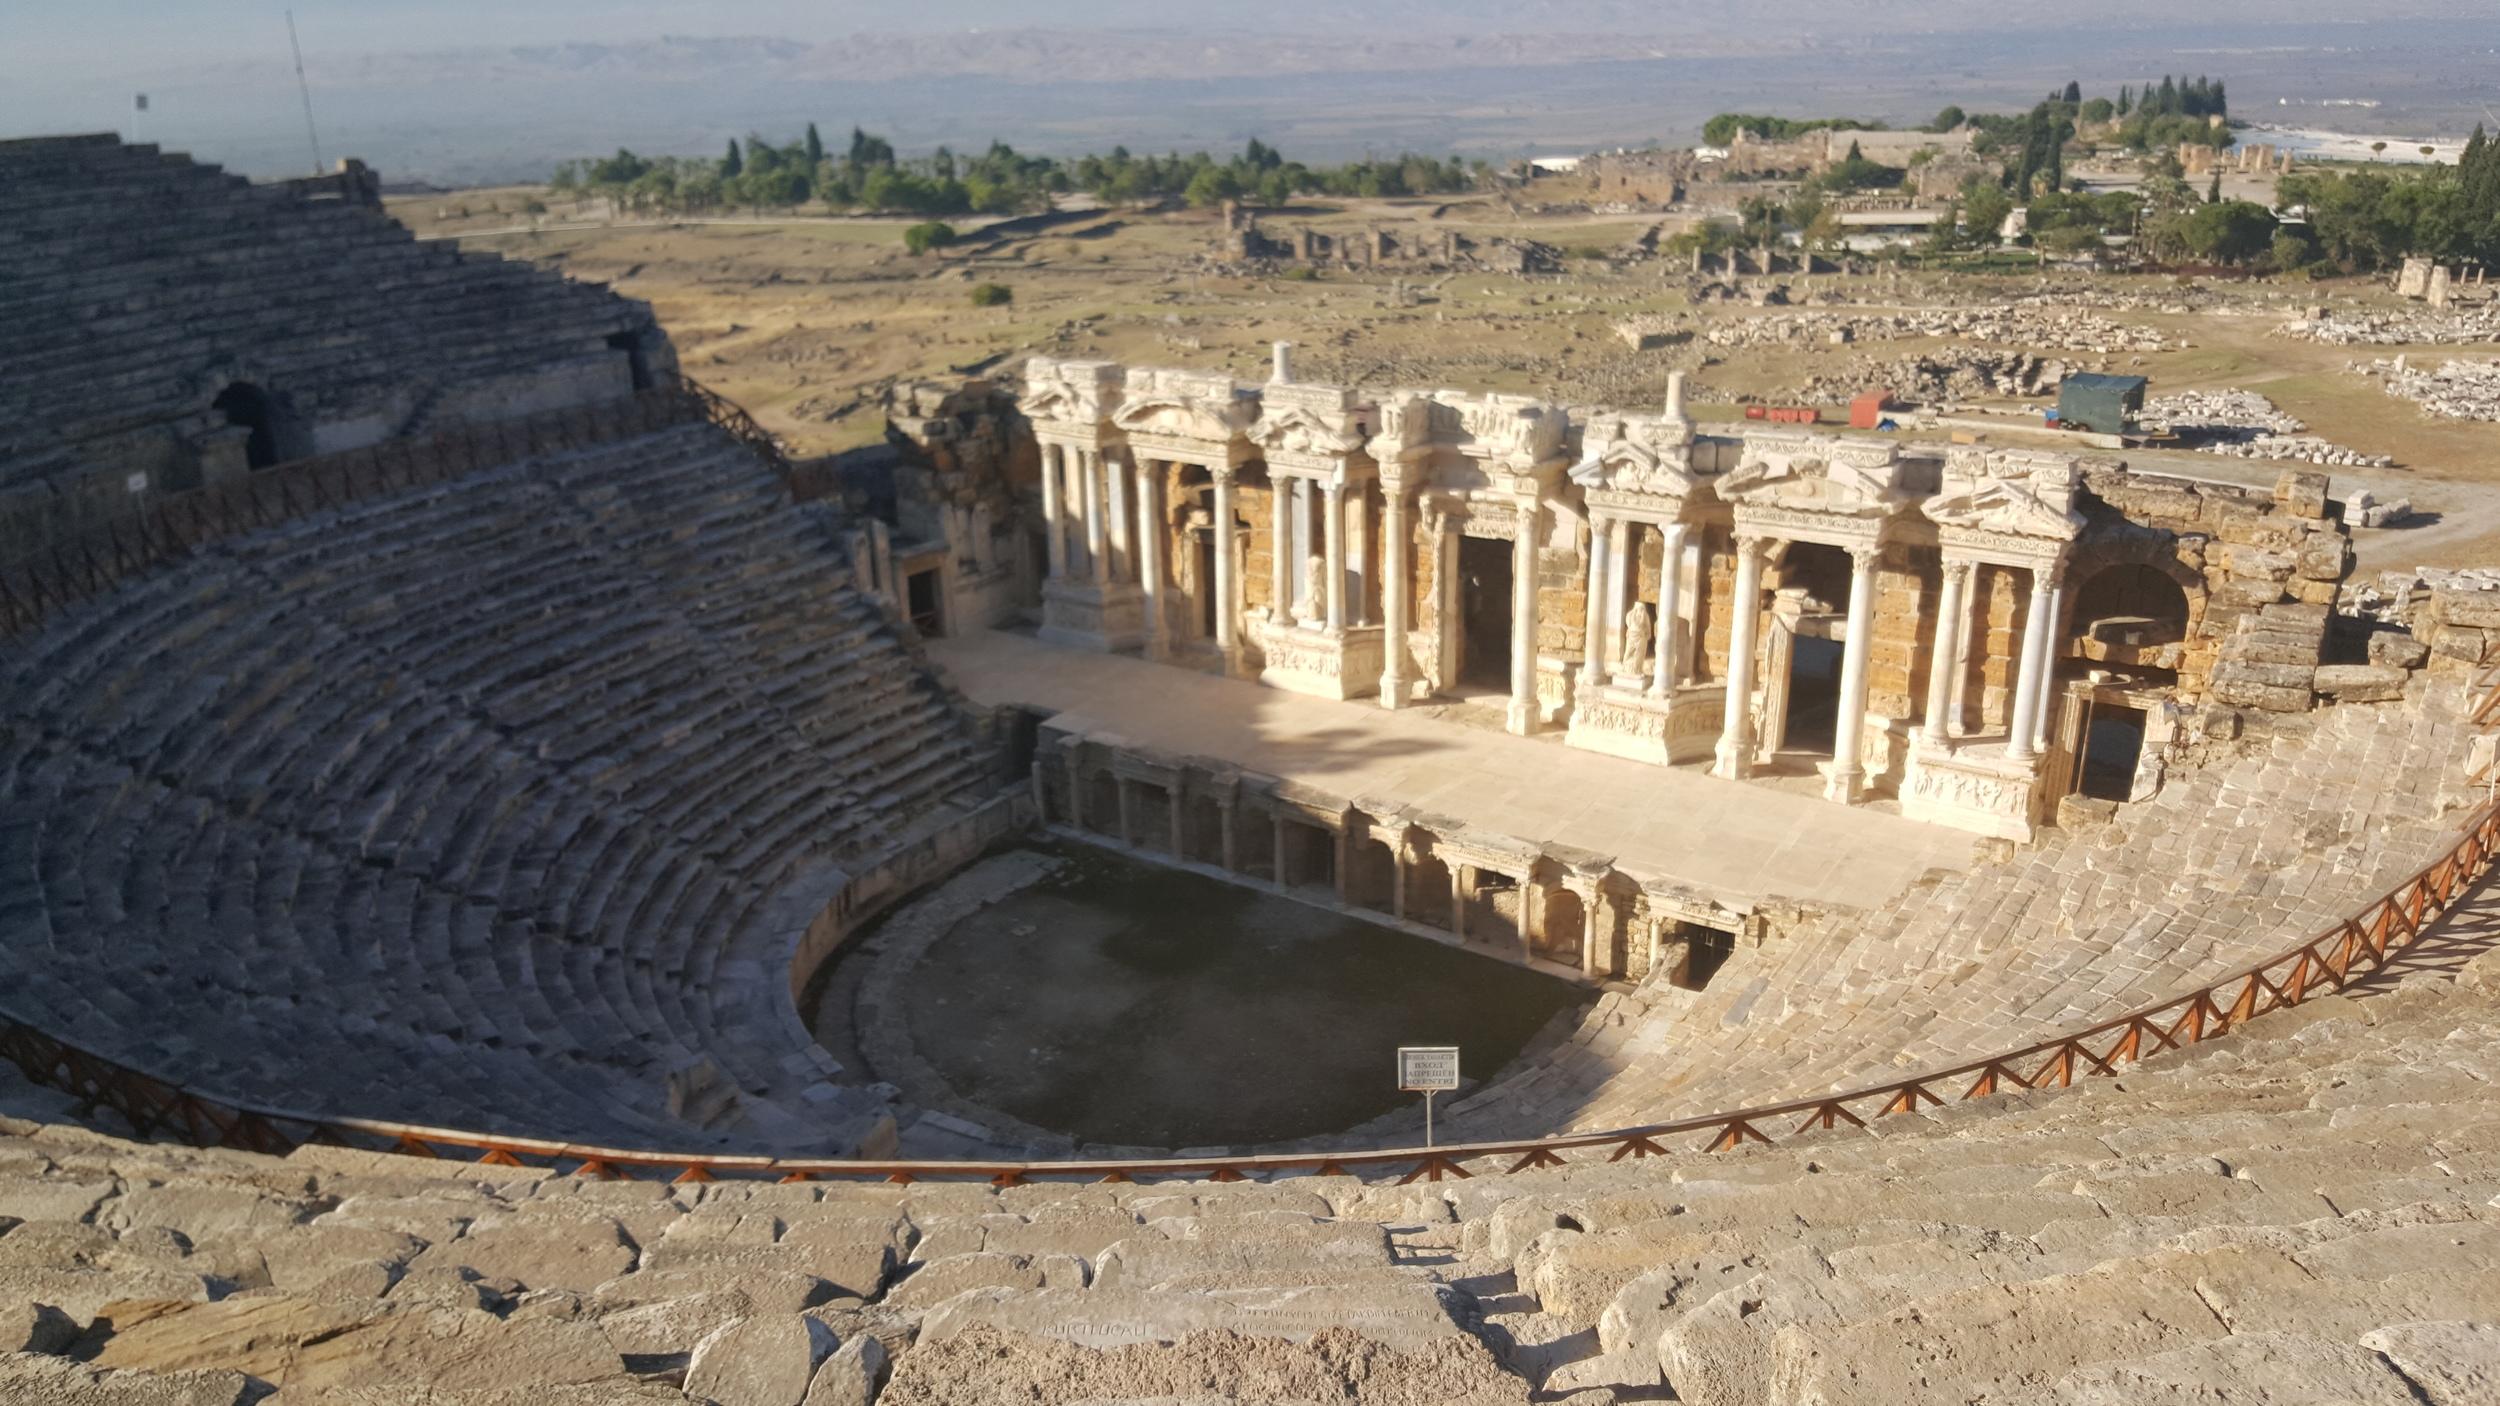 The Roman Theater in Heiropolis, Turkey